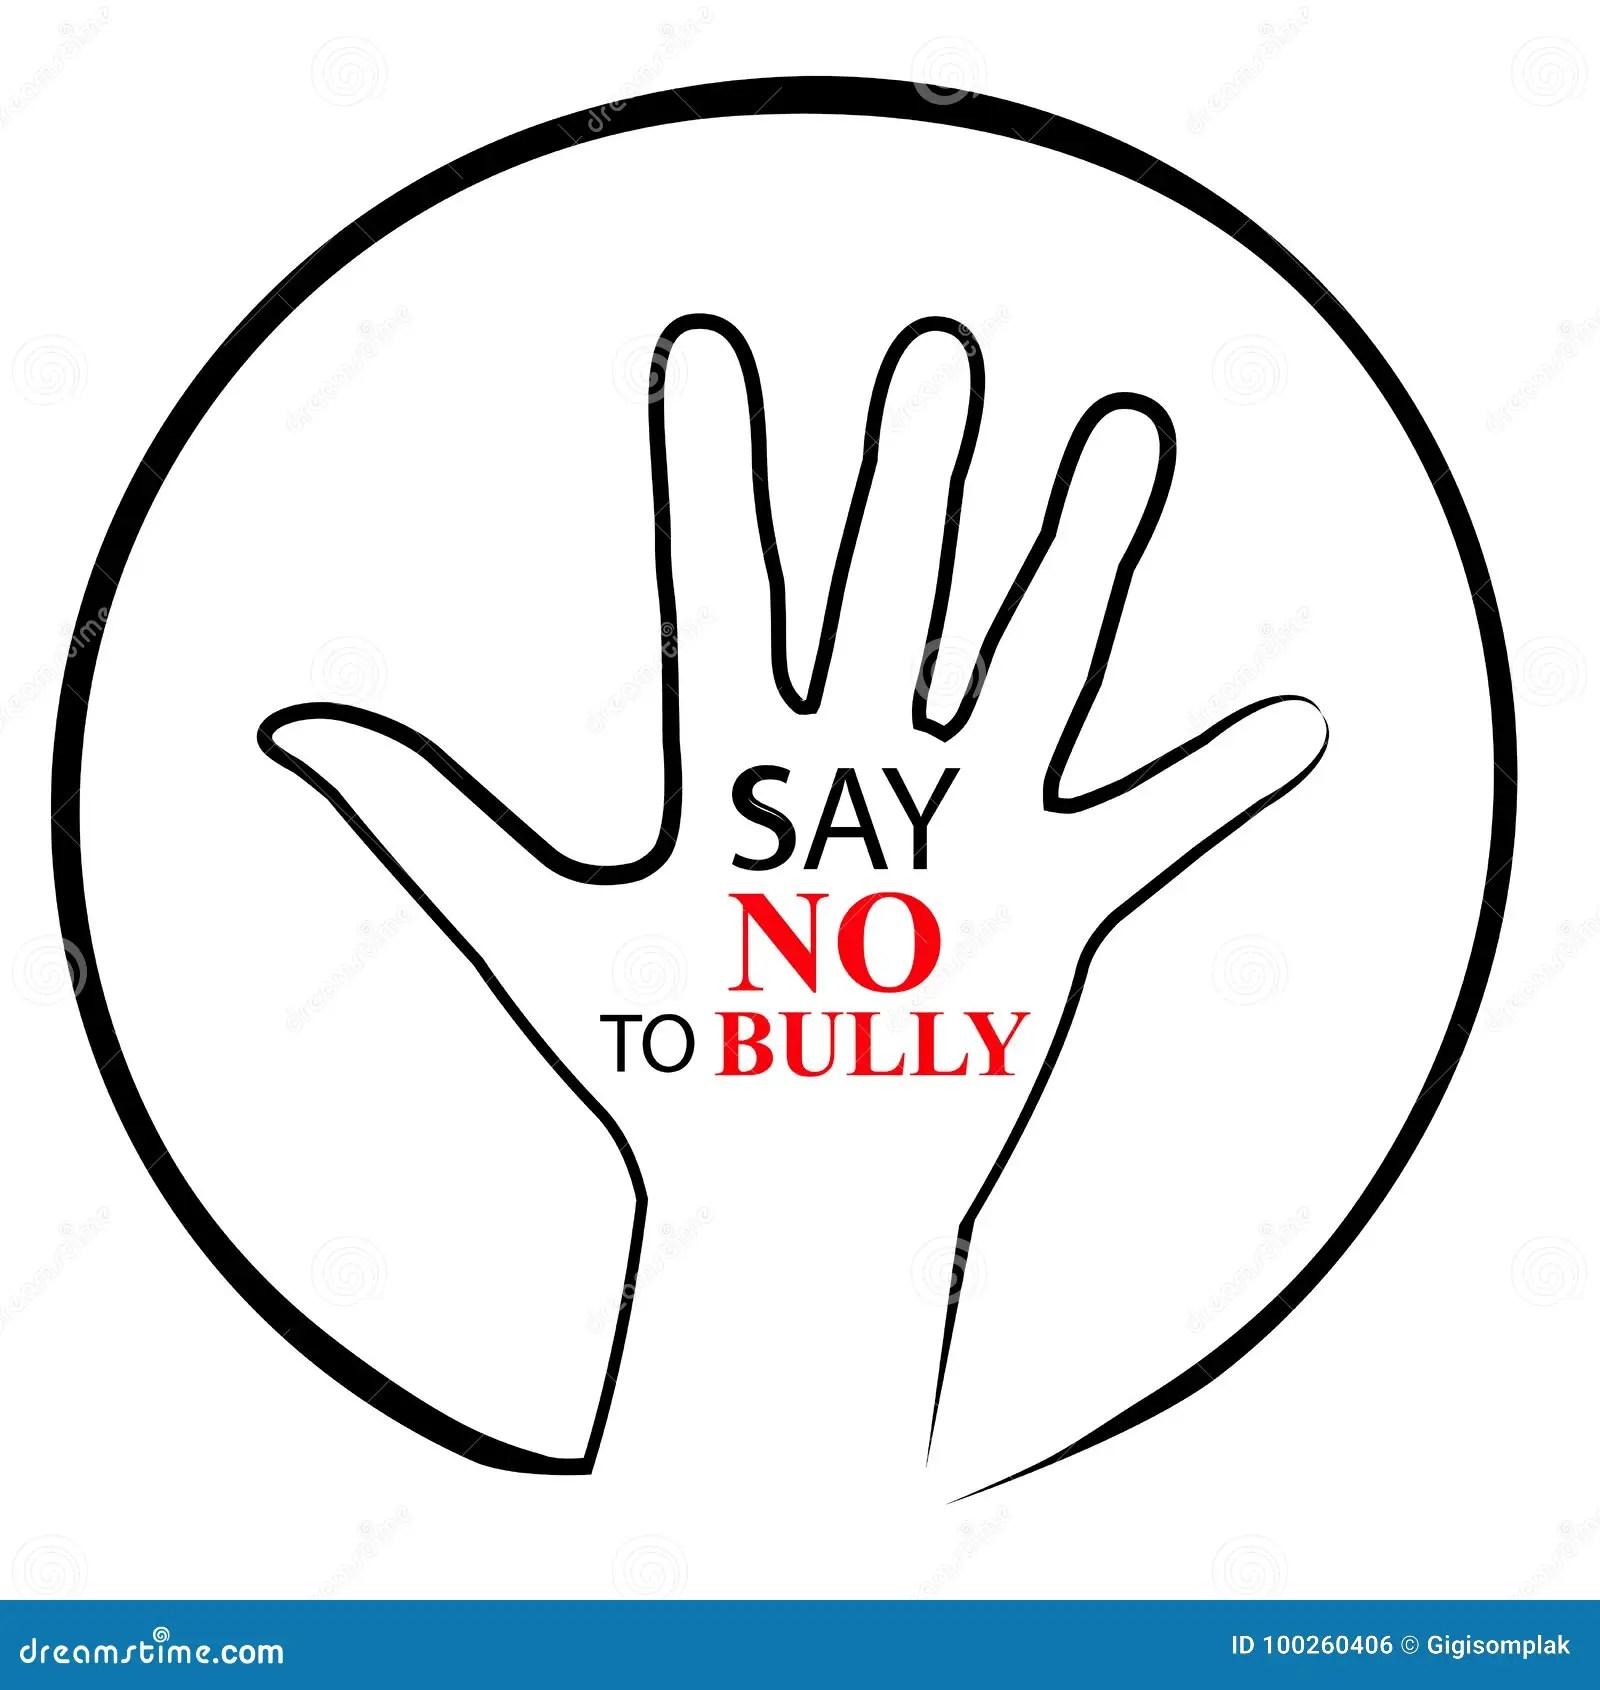 Bully Free Zone Royalty Free Stock Image